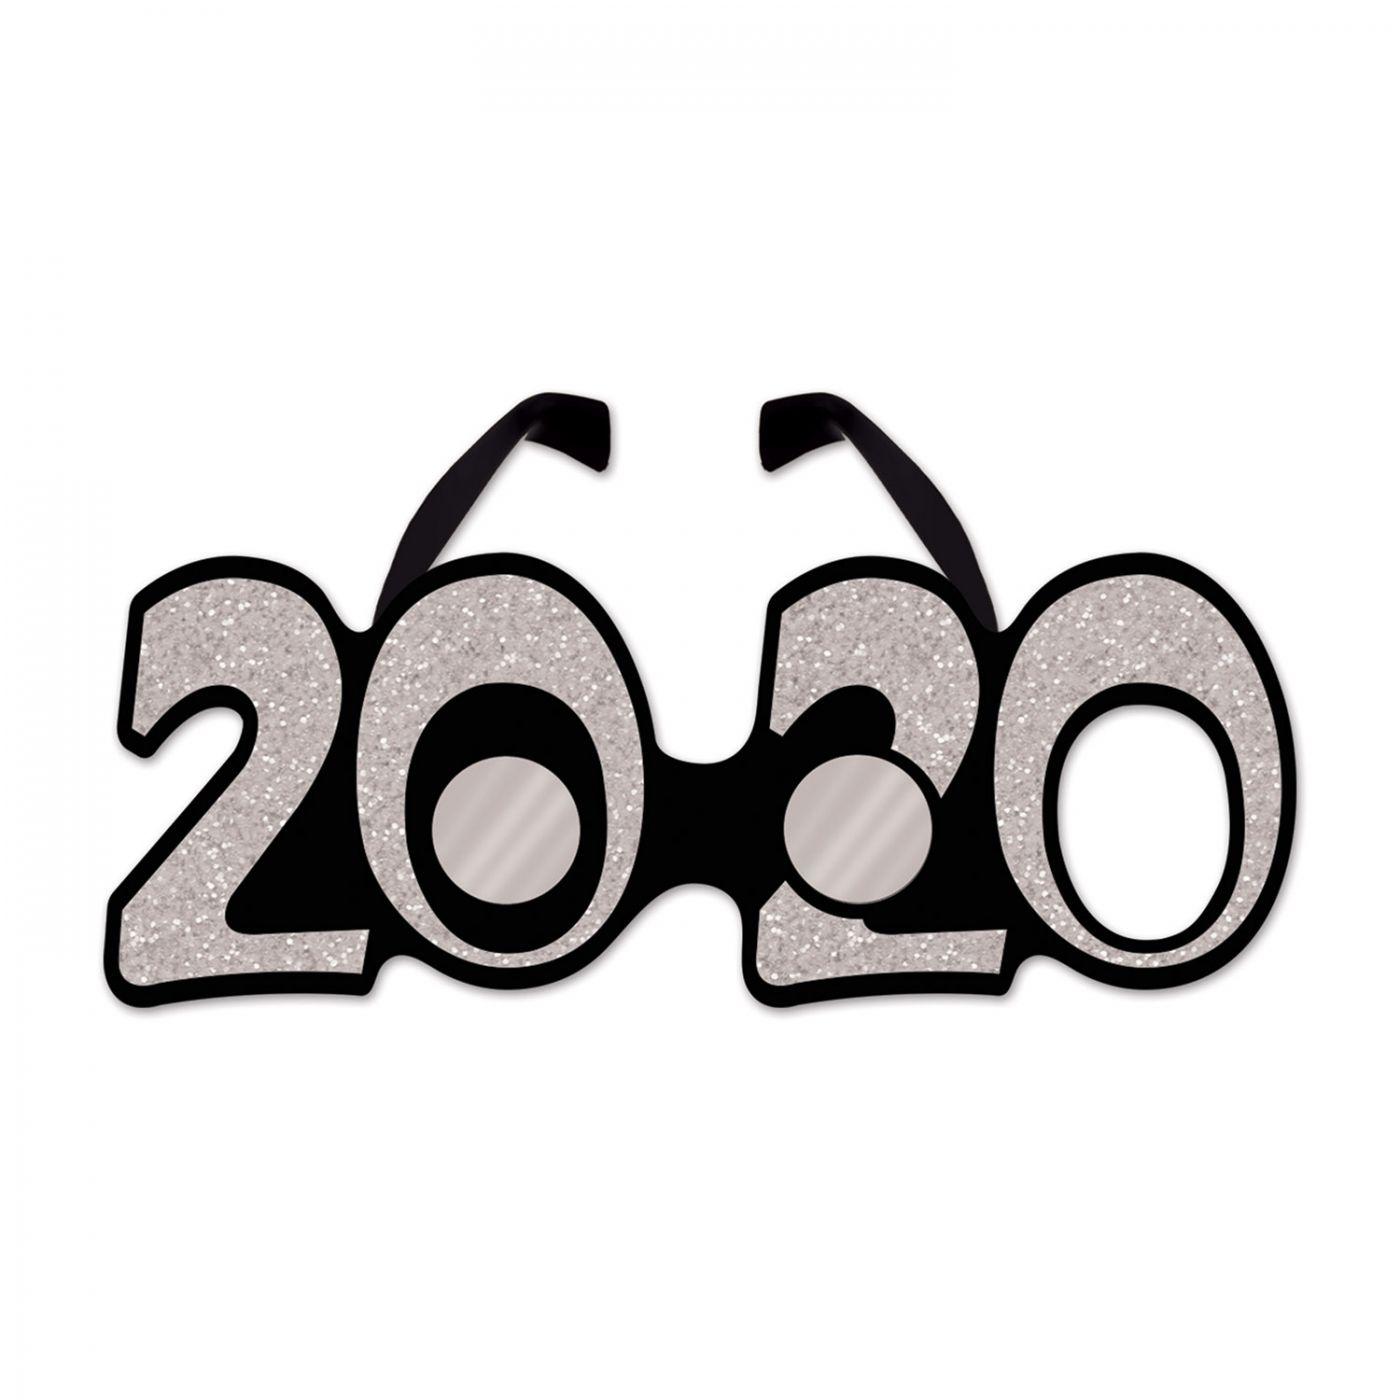 2020  Glittered Plastic Eyeglasses image